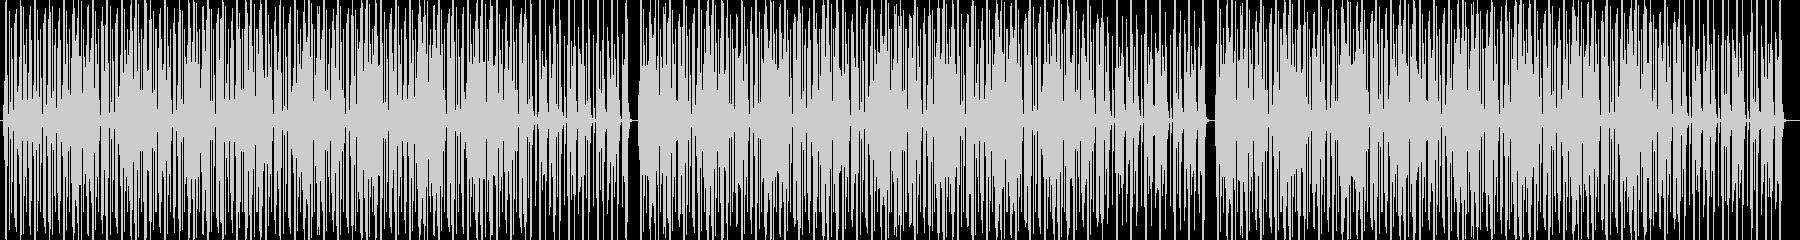 YouTube 口笛・軽快な足踏リズムの未再生の波形